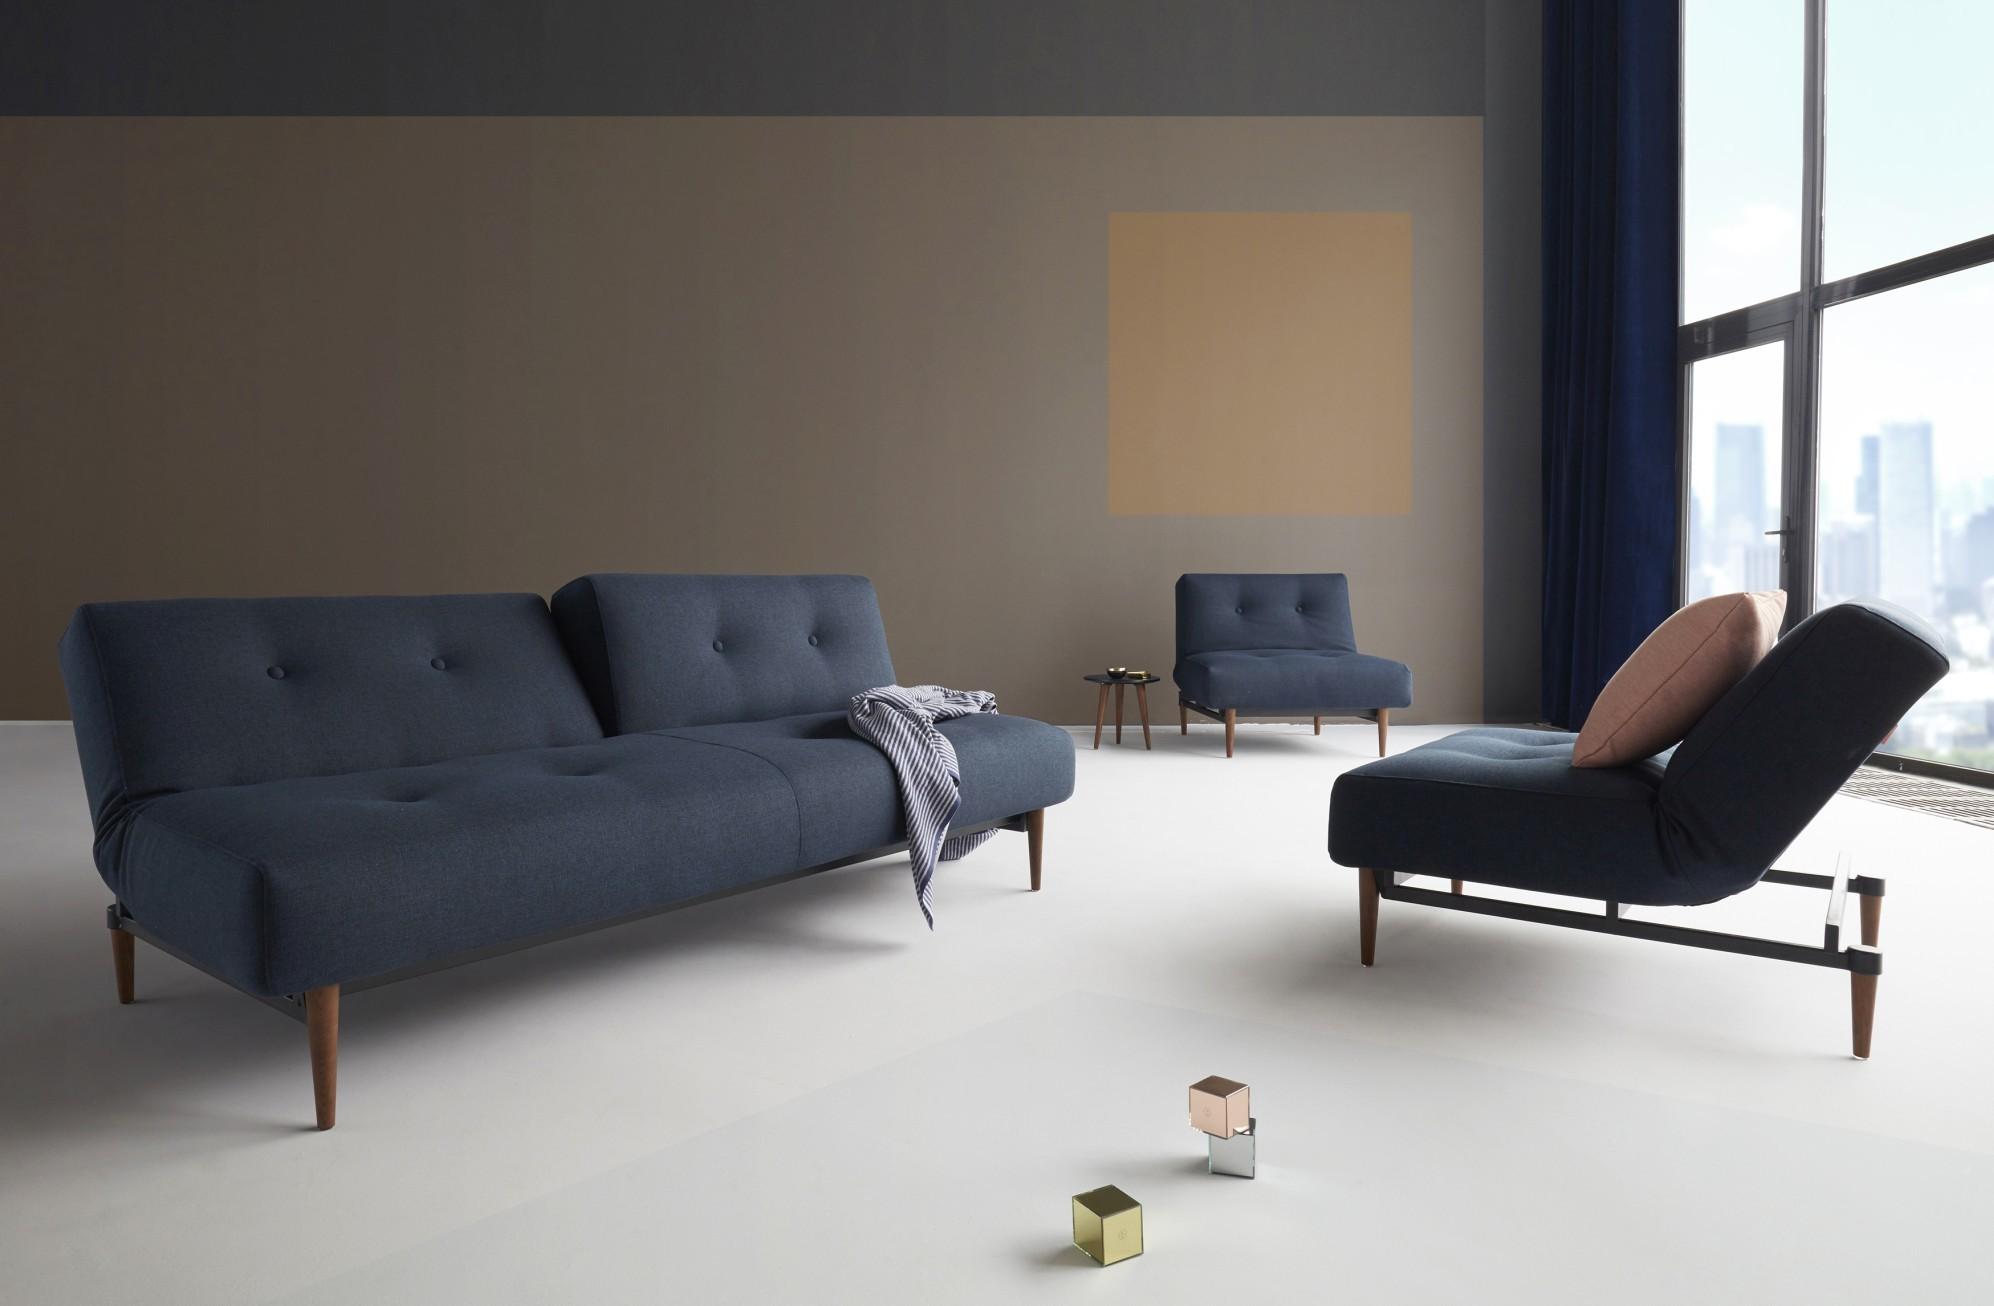 Innovation Slaapbank Ample - Styletto Poten Donker - Mixed Dance 528 - Blauw